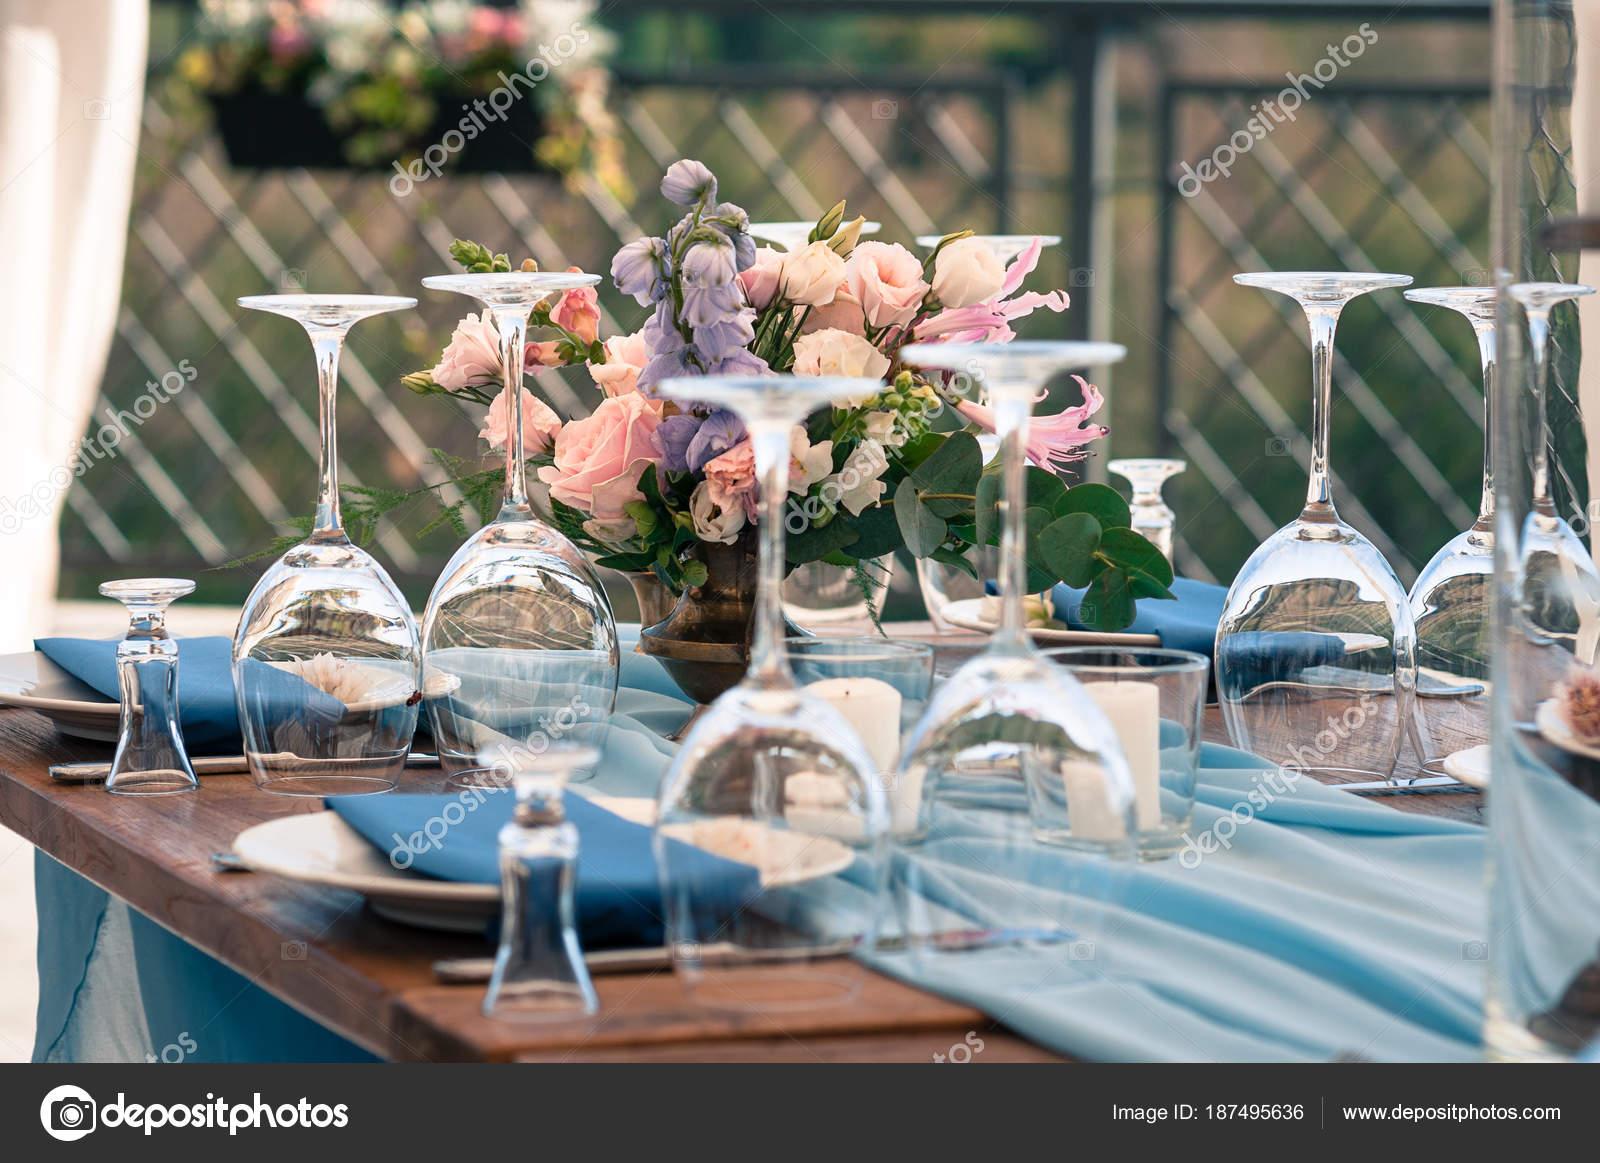 Svatba Nebo Udalosti Dekorace Tabulky Nastaveni Modre Ubrousky